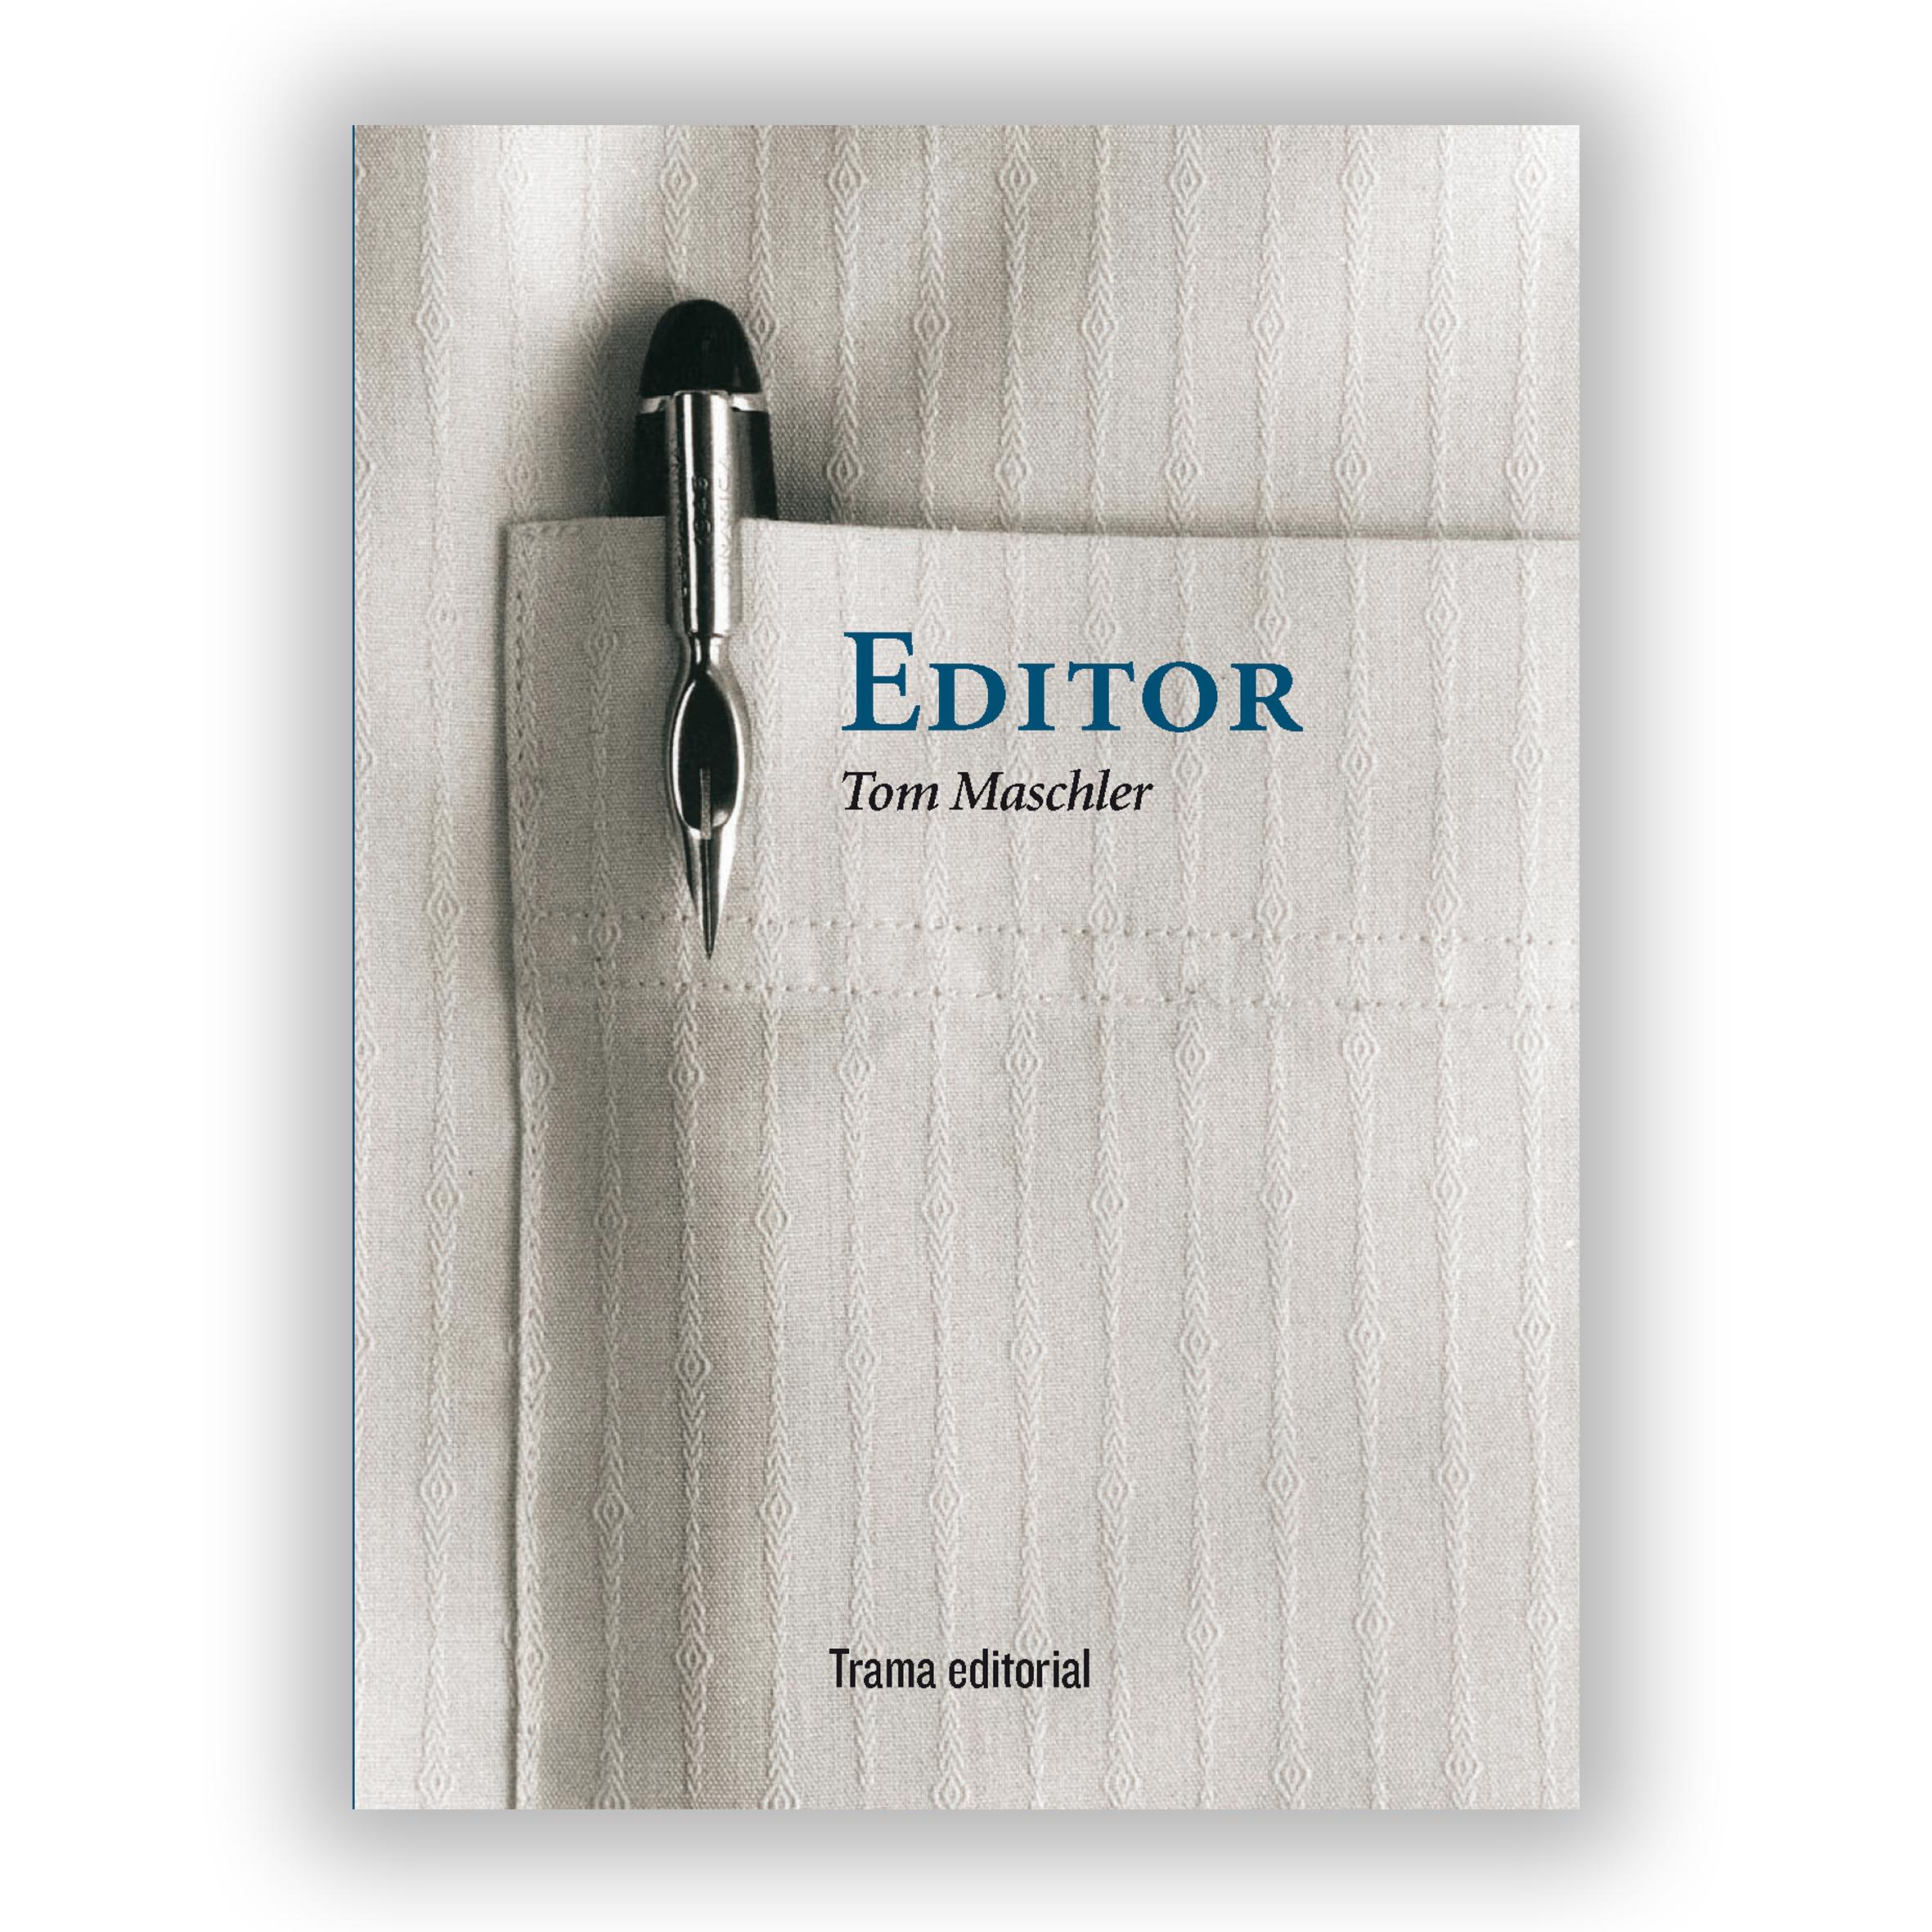 El editor que tenía claro que no sería editor. Juan Tallón en Jot Down. Sobre Editor de Tom Maschler